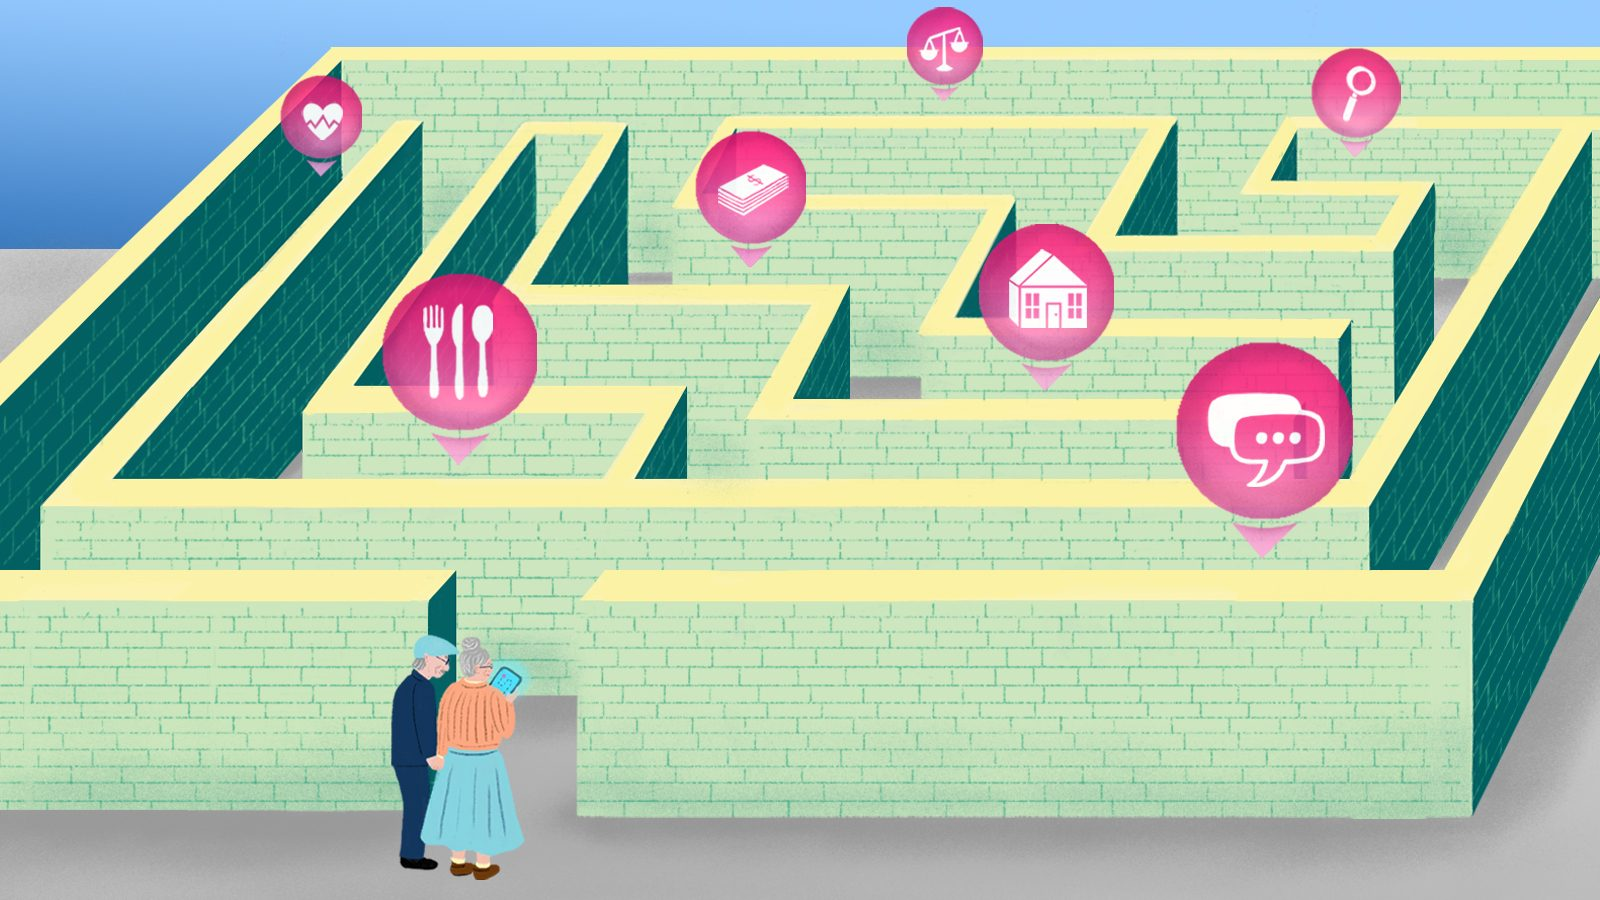 Illustration by Sophie Berg of elderly couple entering maze of digital icons.